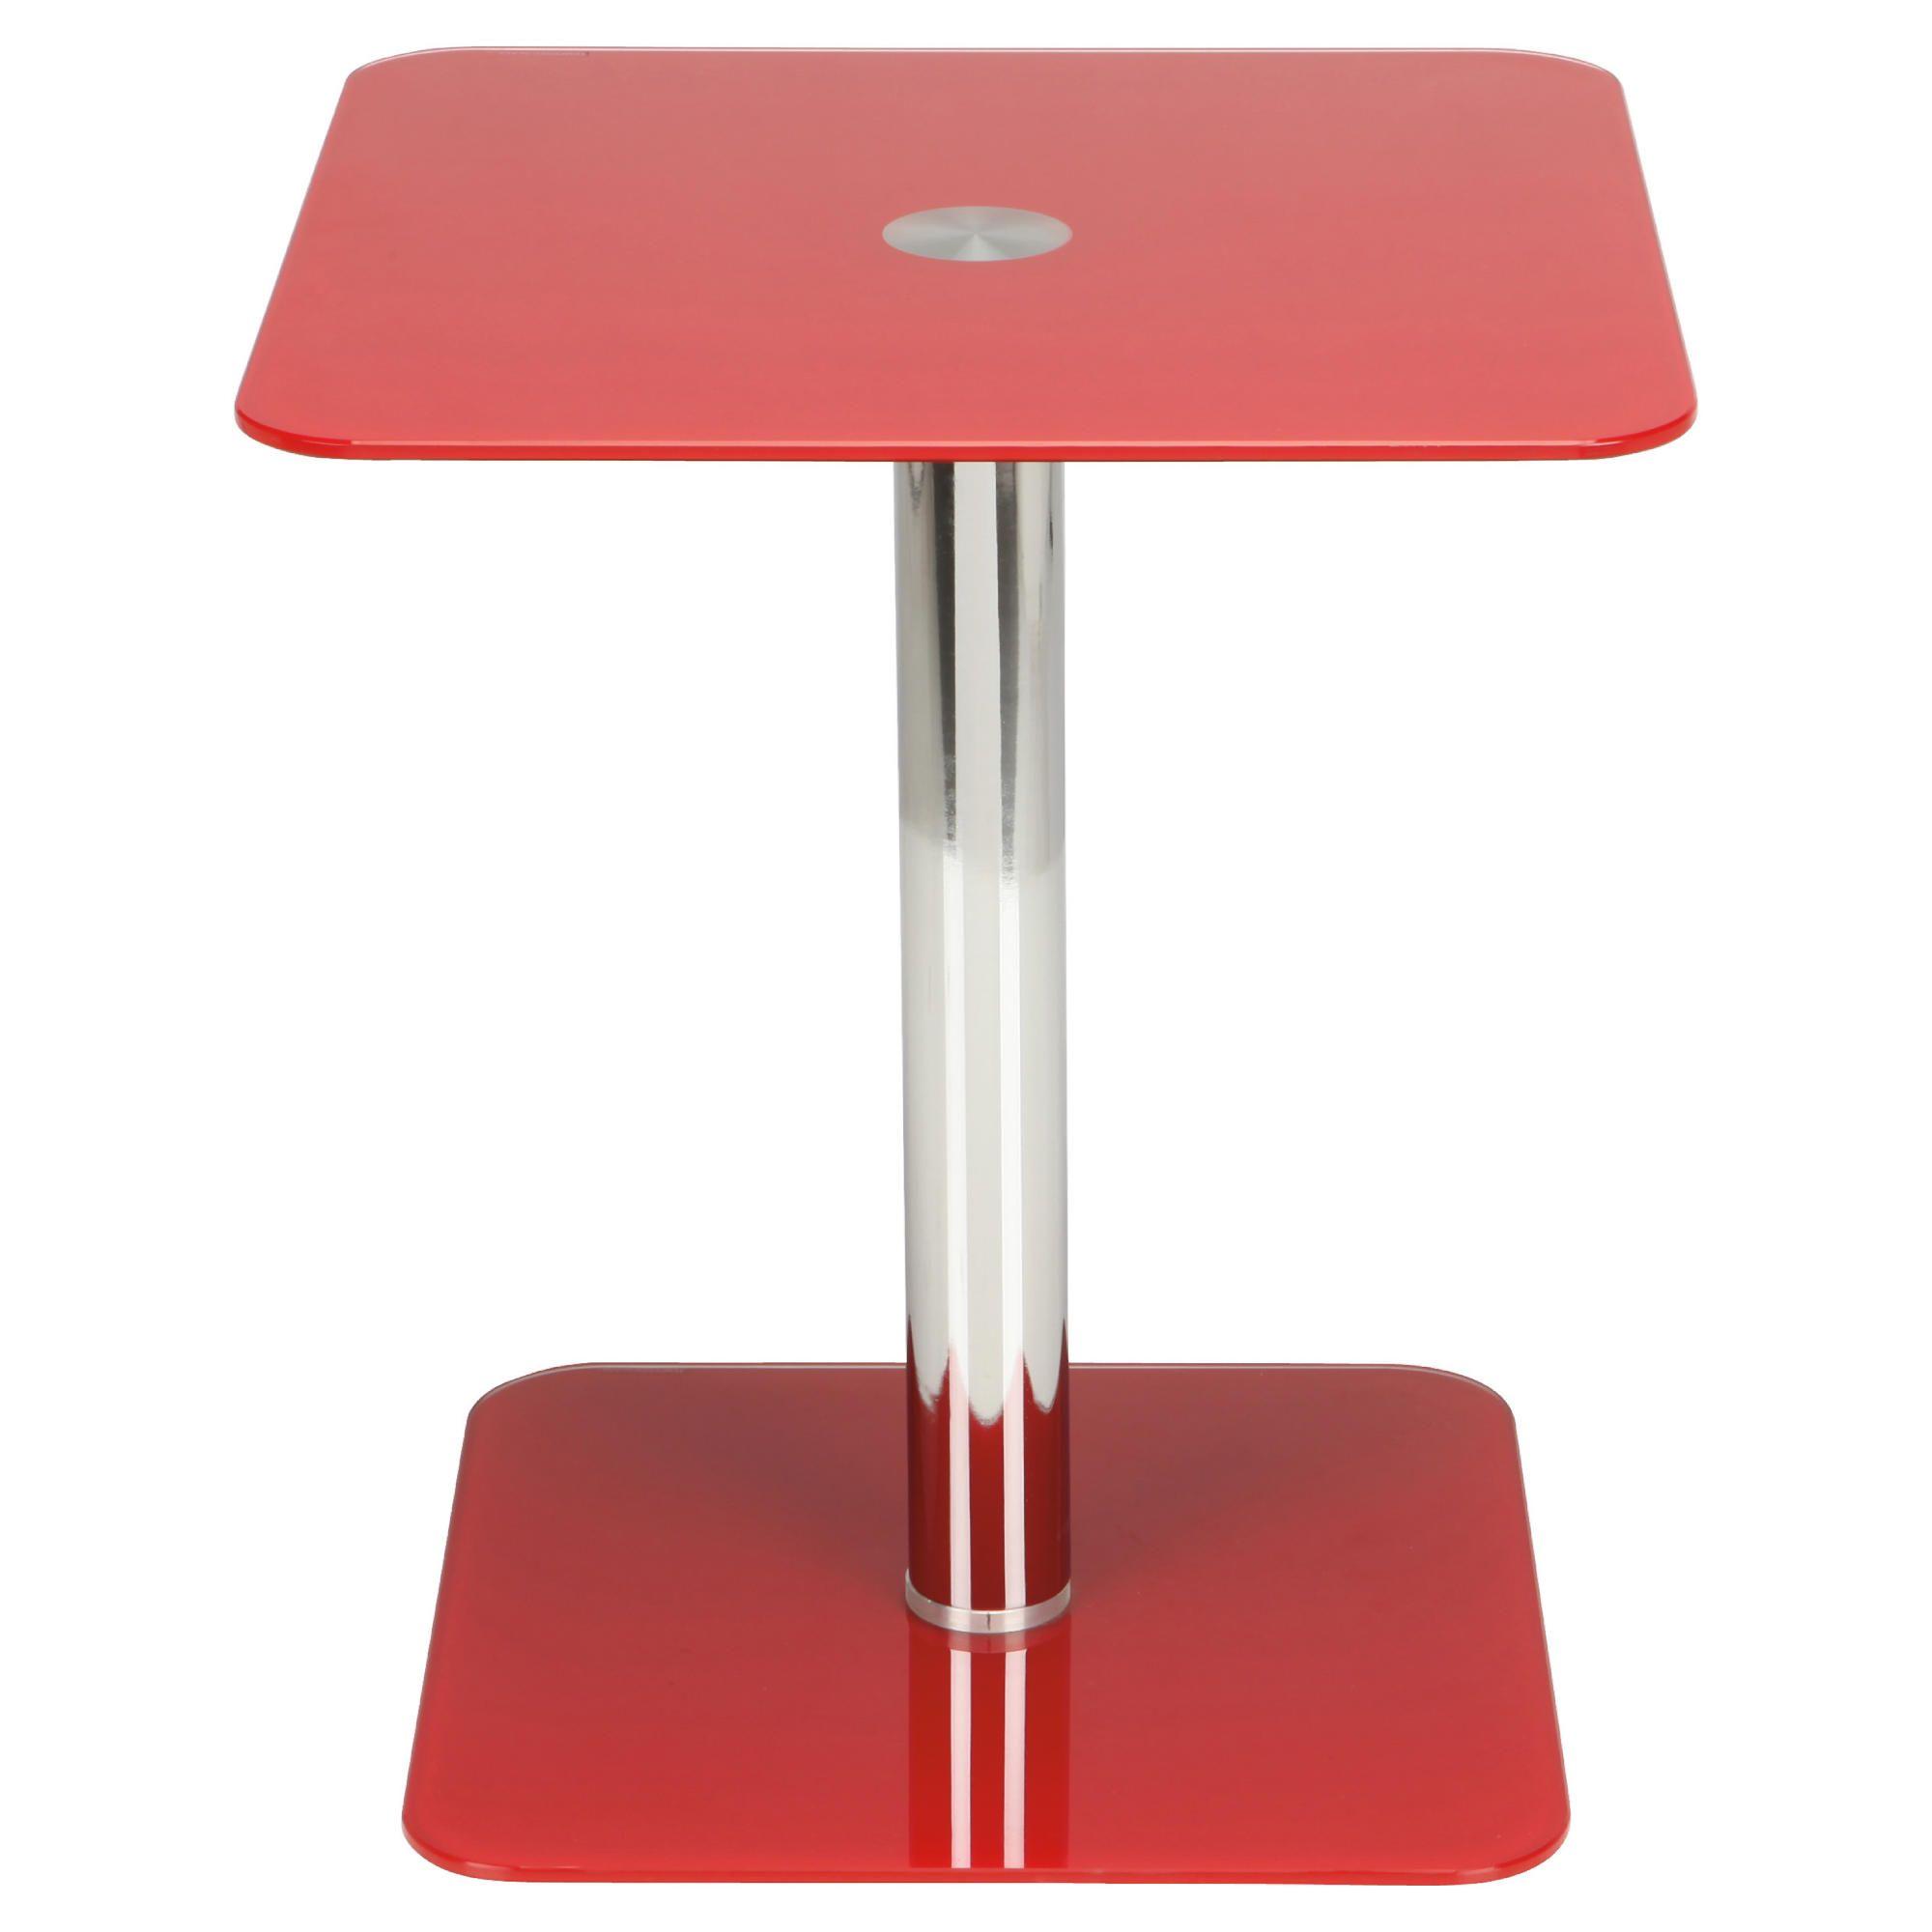 Tesco Atom Pedestal Side Table, Red